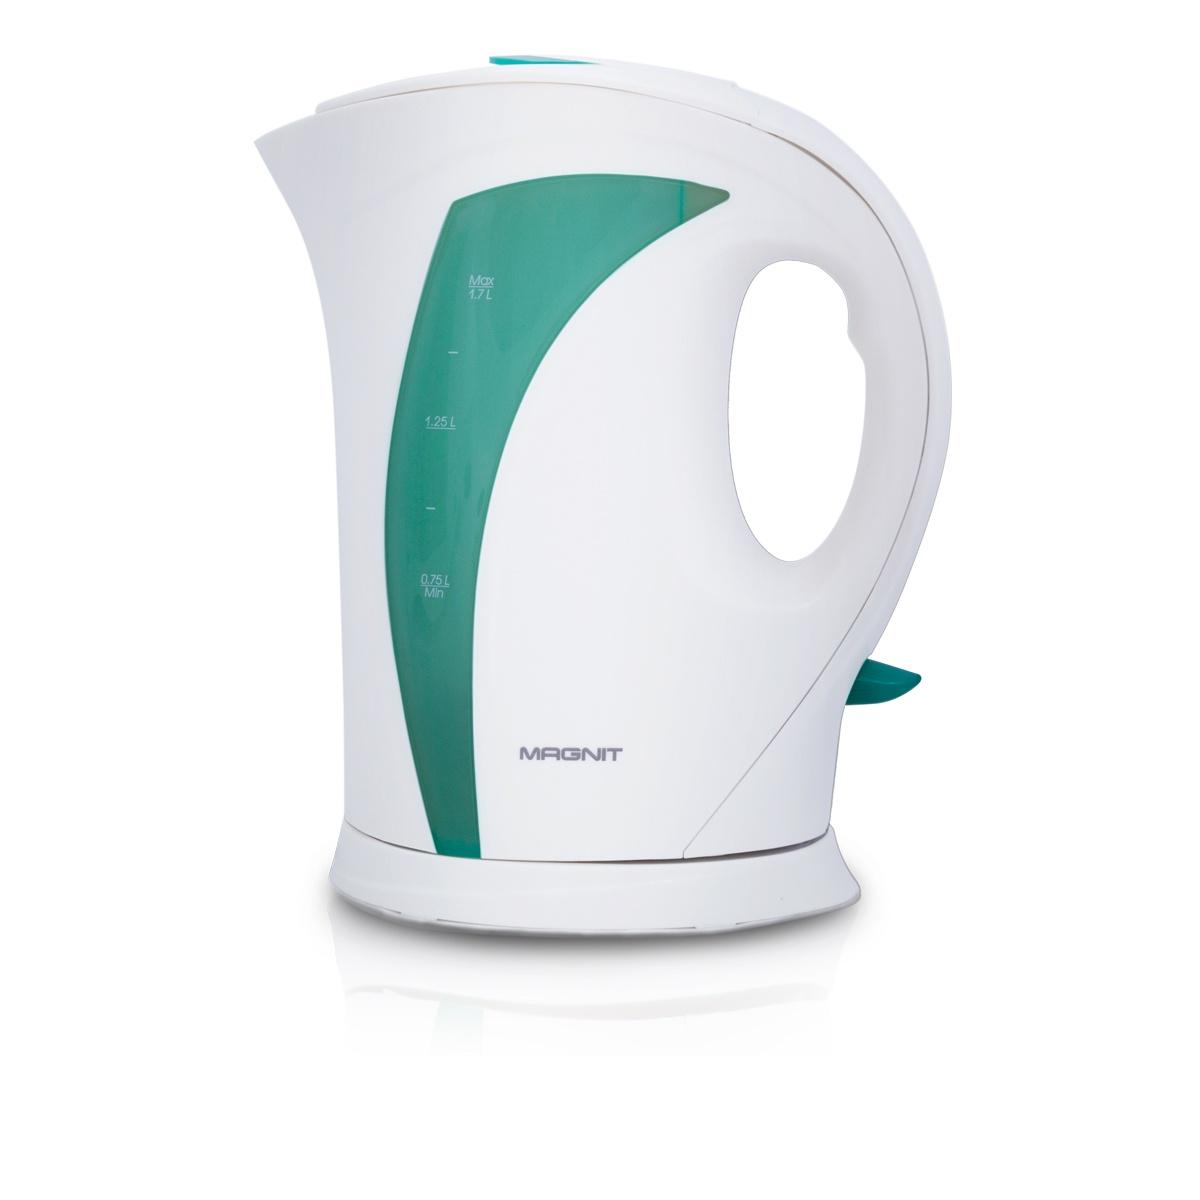 Электрический чайник MAGNIT RMK-2191 цена 2017